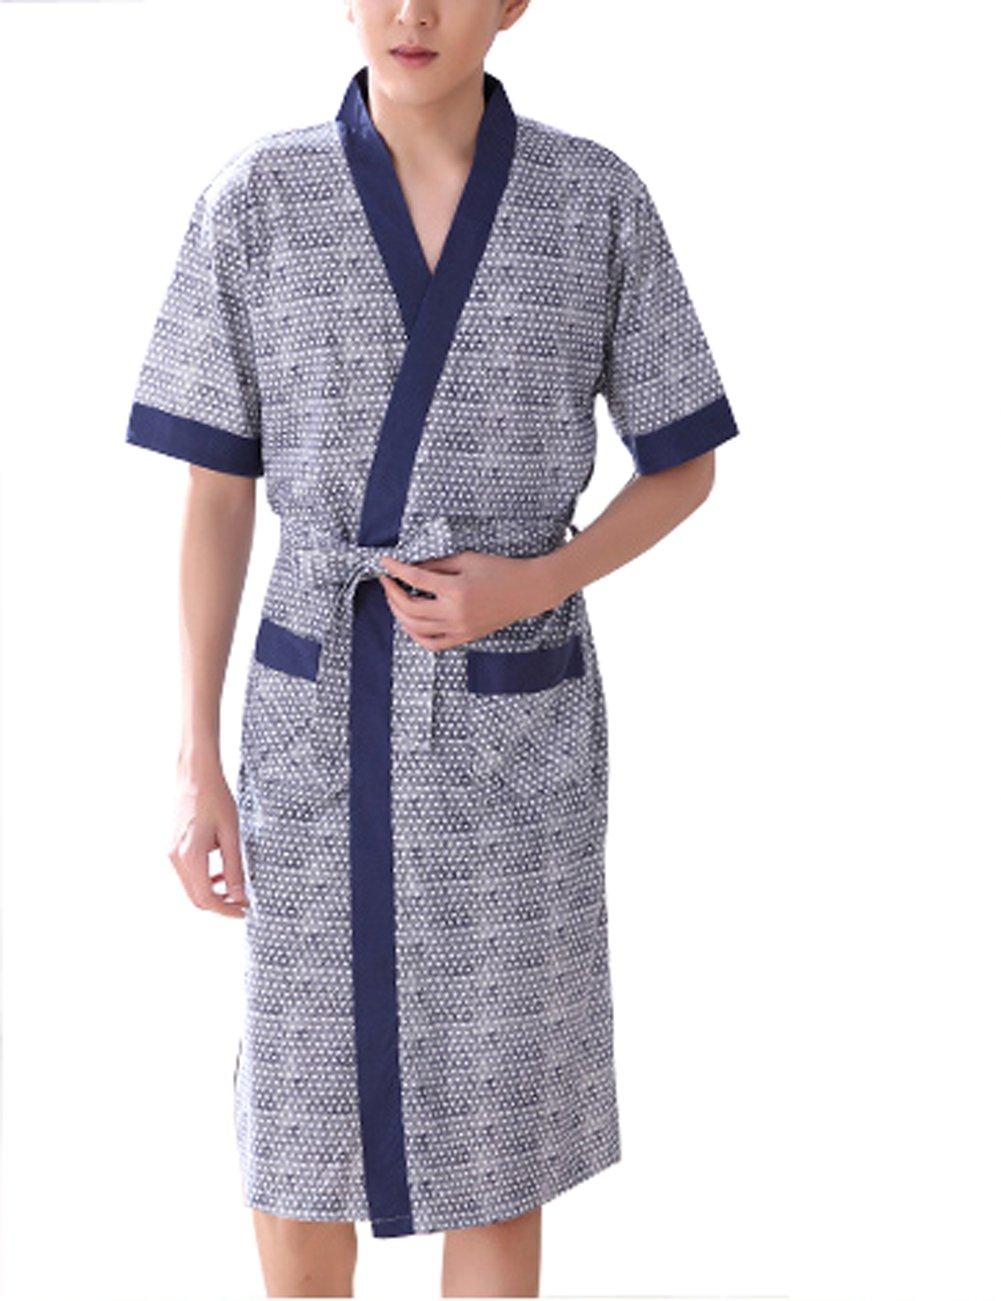 KM Men Shawl-Neck Short Sleeve Cotton Bathrobe Summer Long Loungewear (White dots, XXL)